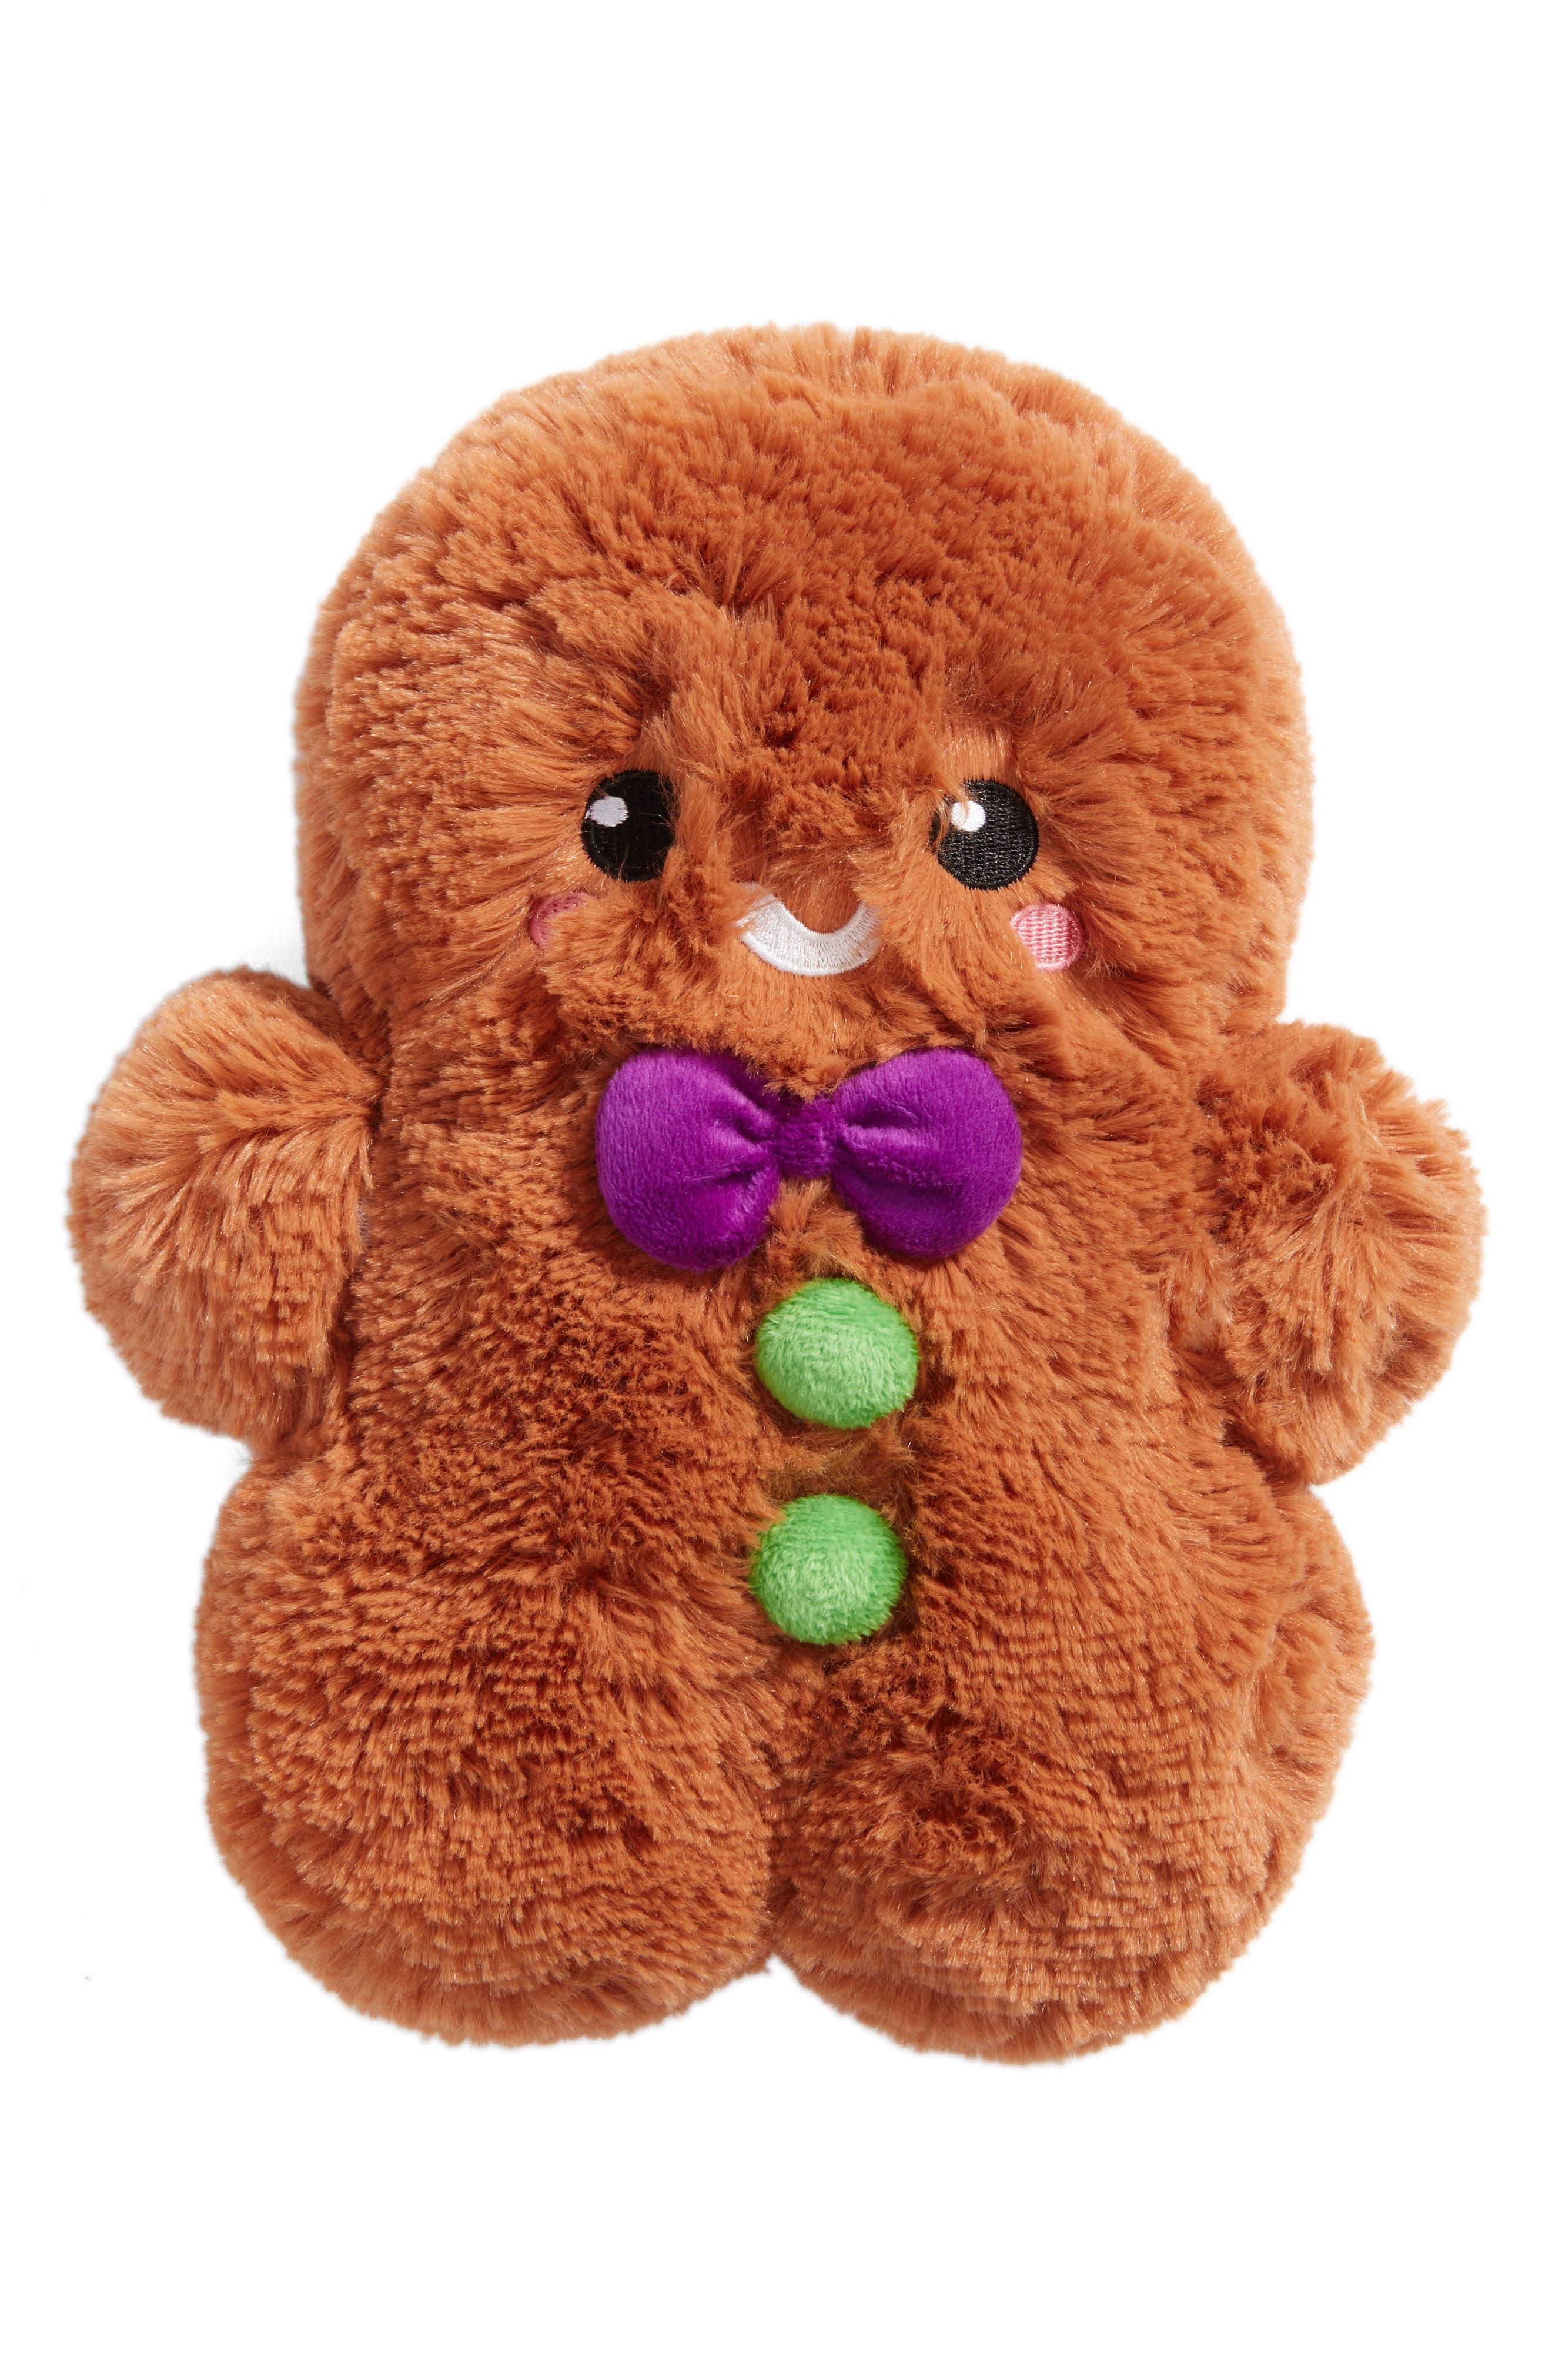 Mini Gingerbread Man Stuffed Toy,                             Main thumbnail 1, color,                             200